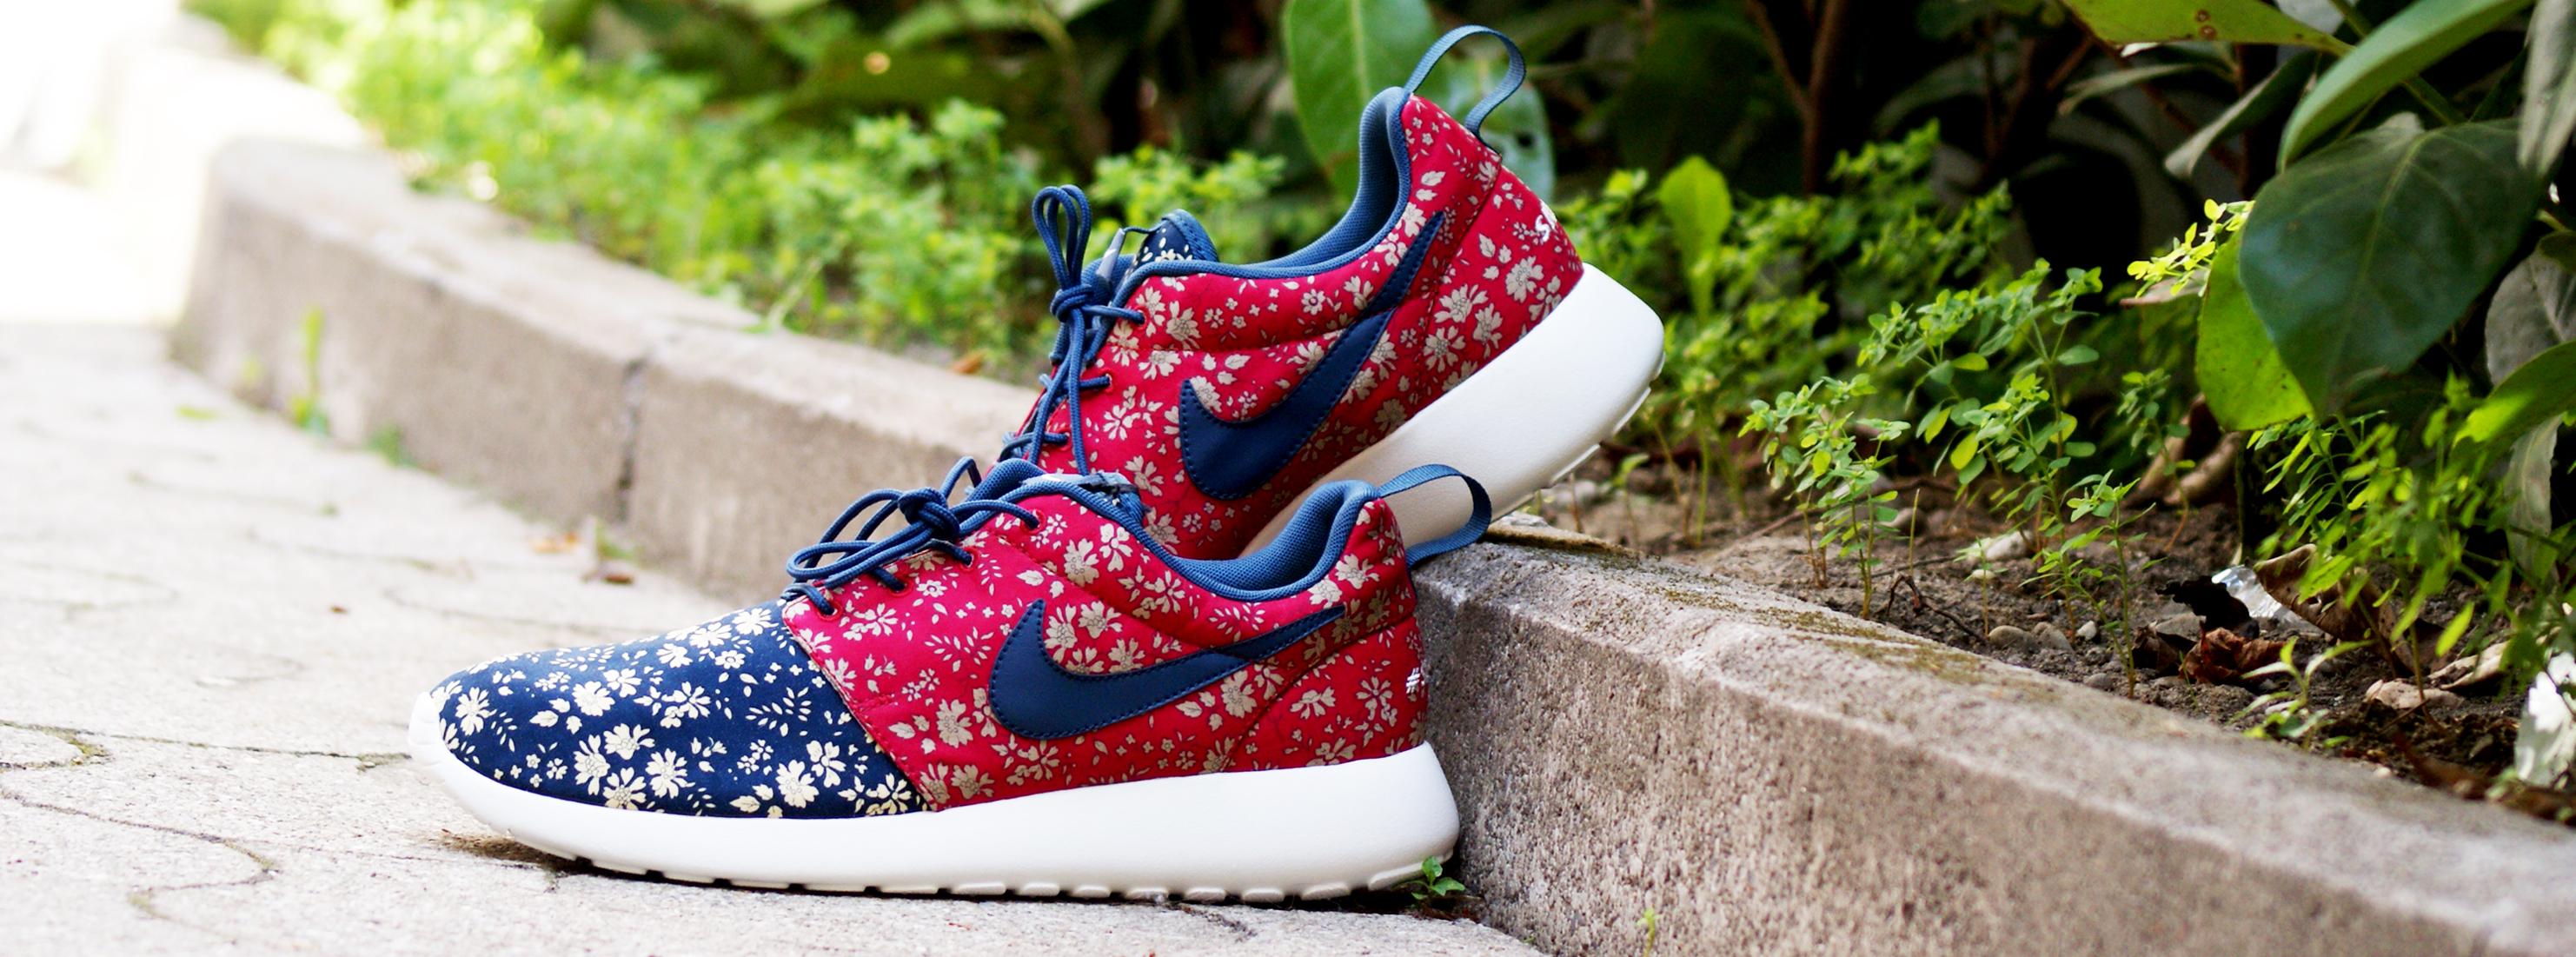 NIKE_ROSHE_RUN_PREMIUM_LIBERTY _iD_sneakerskills